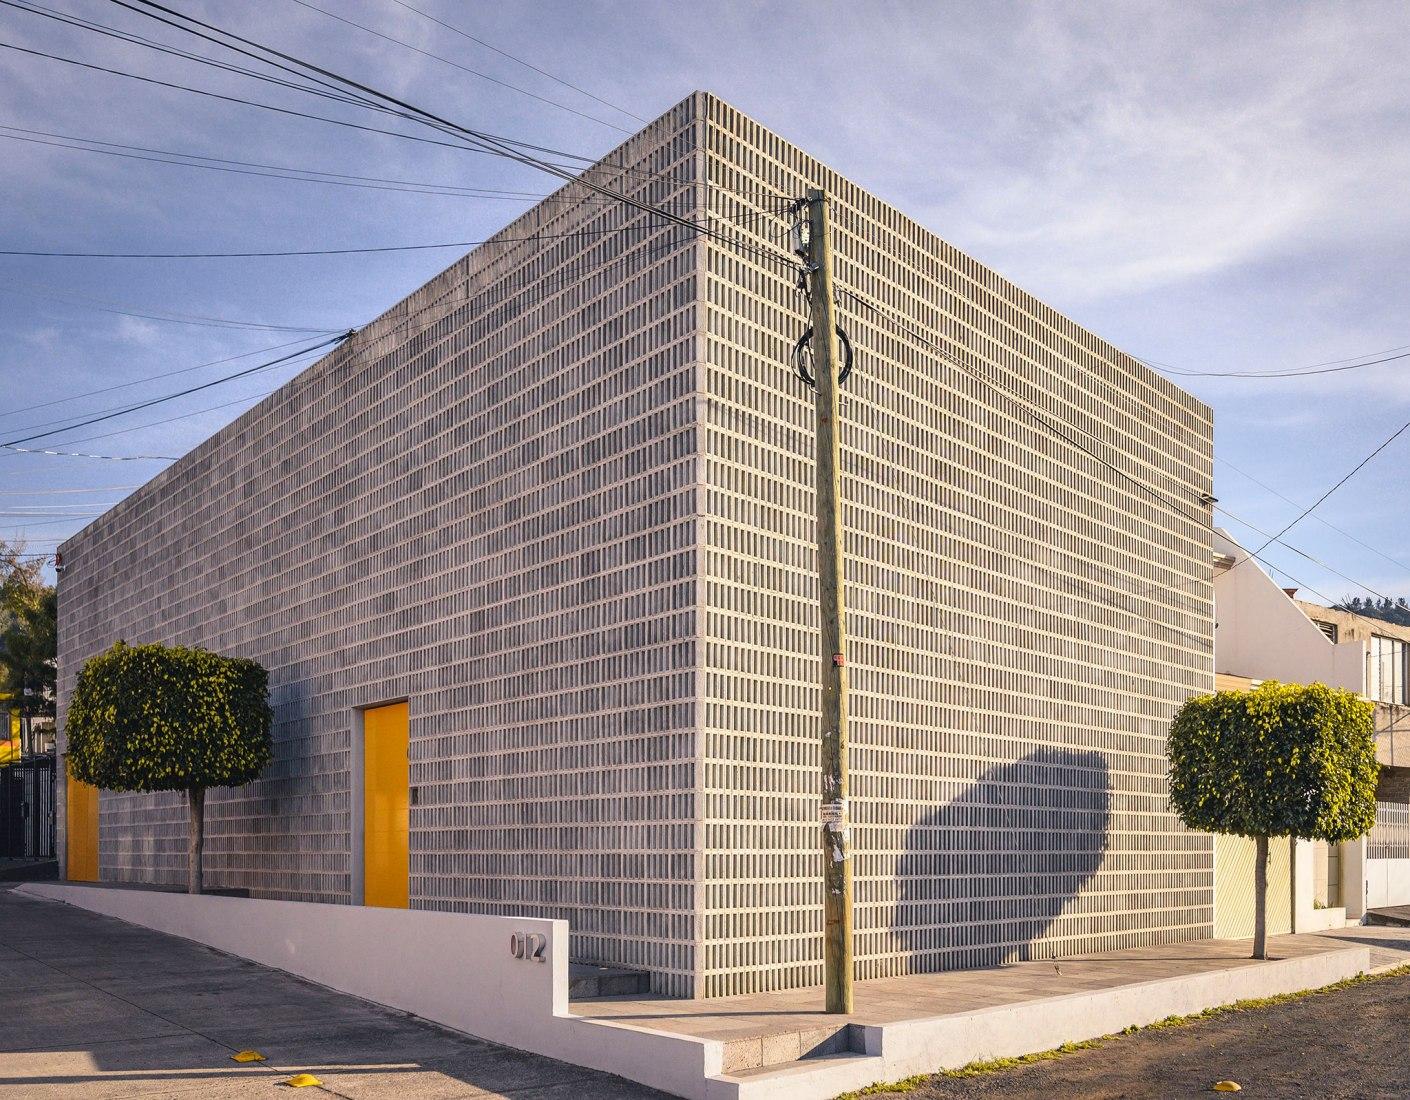 WOL Center por Iván Marín + Doho Constructivo. Fotografía por José Carlos Macouzet